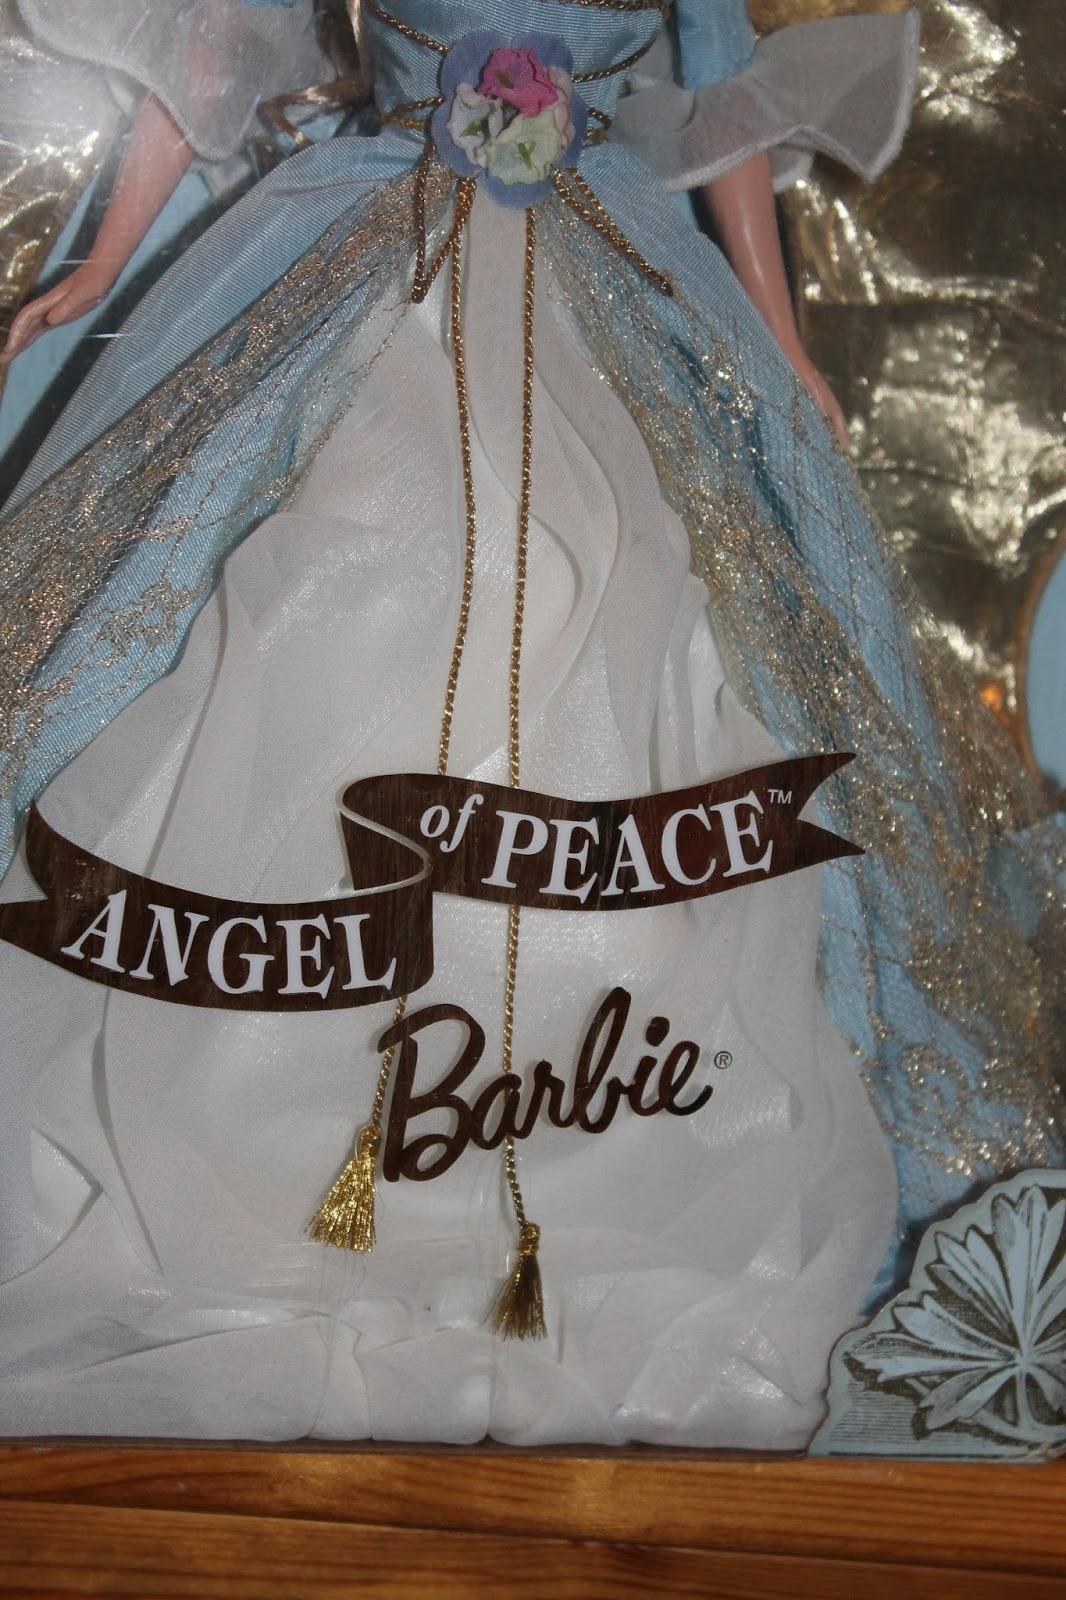 barbie-angel-of-peace